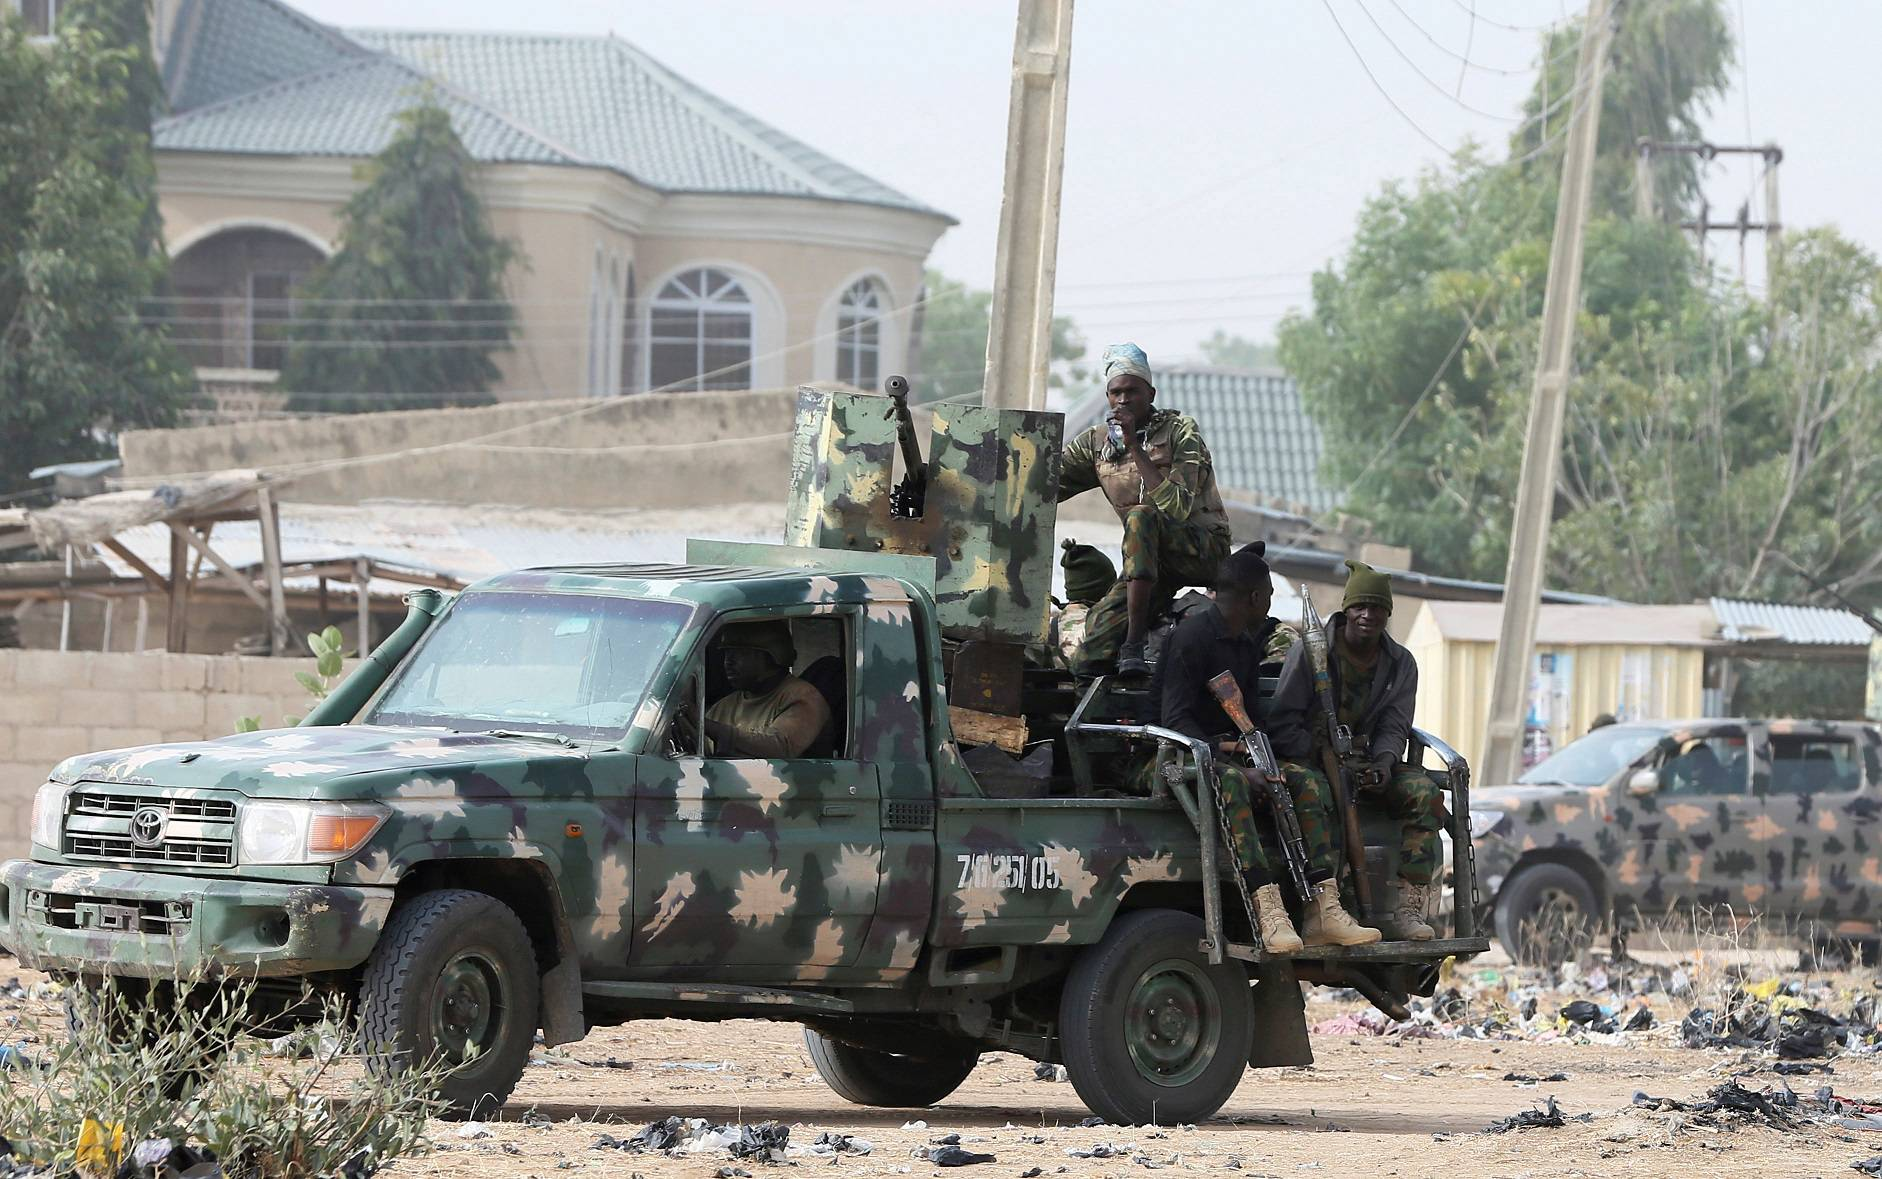 FILE PHOTO: Nigerian military secure an area where a man was killed by suspected militants near Maiduguri